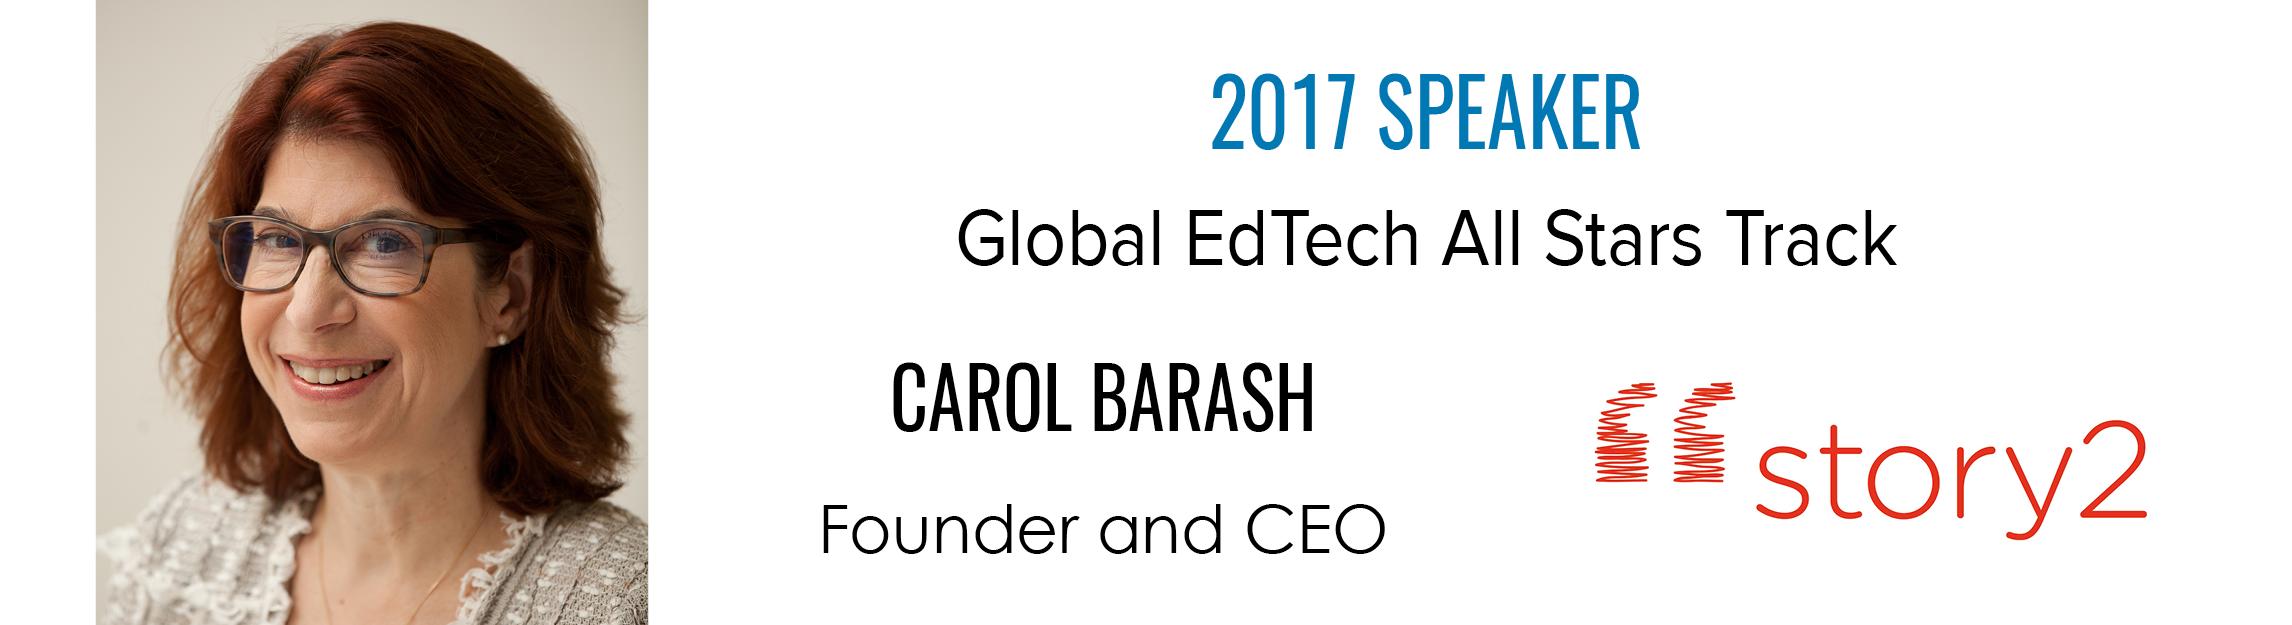 Carol Barash_Story 2_ Global Ed T.png